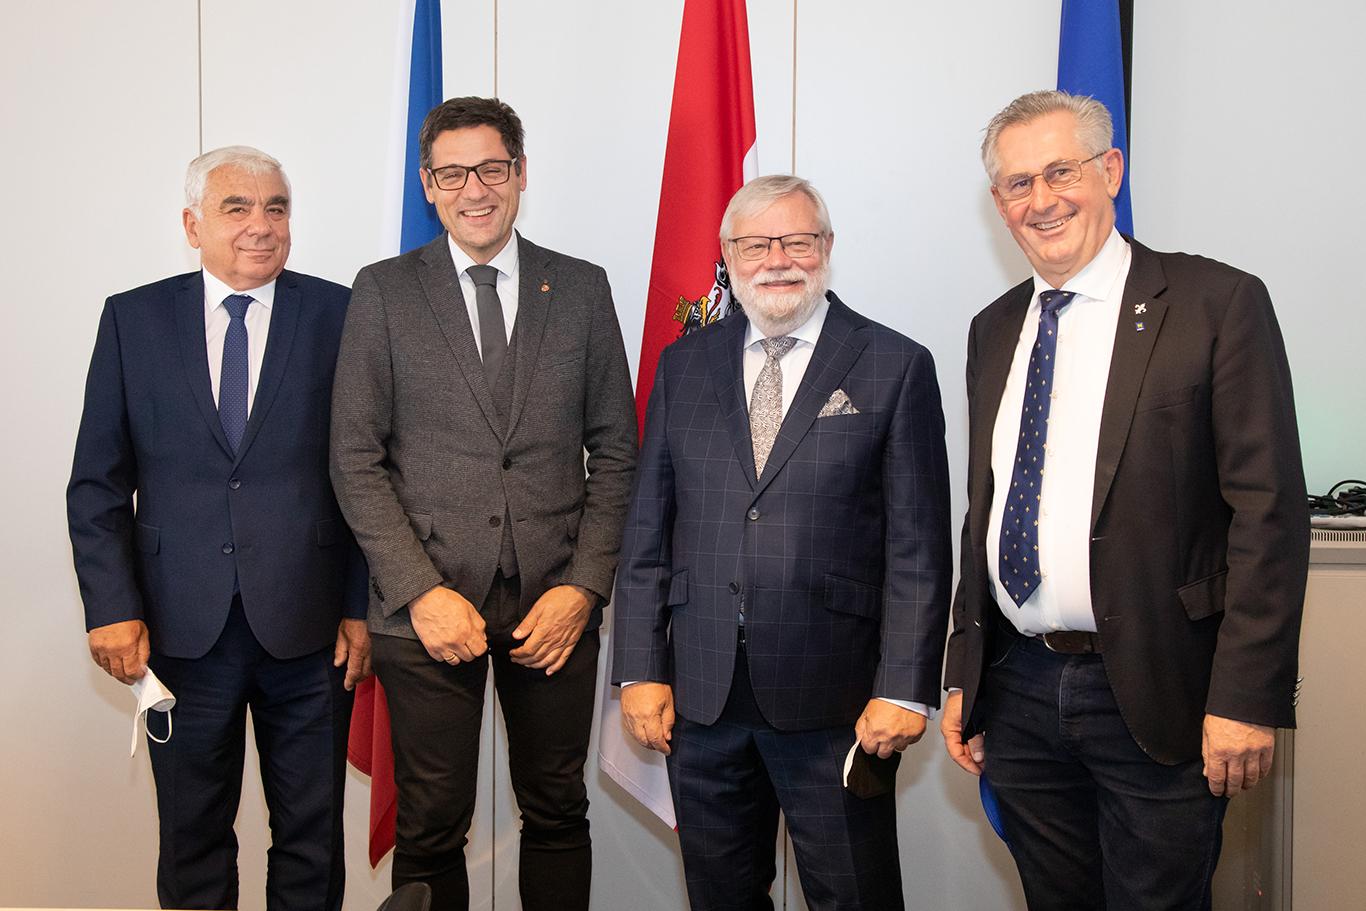 Von links: Jiri Vosecky, Senator, Bundesratspräsident Peter Raggl (ÖVP), Jiri Oberfalzer, Senator, Bundesrat Martin Preineder (ÖVP)